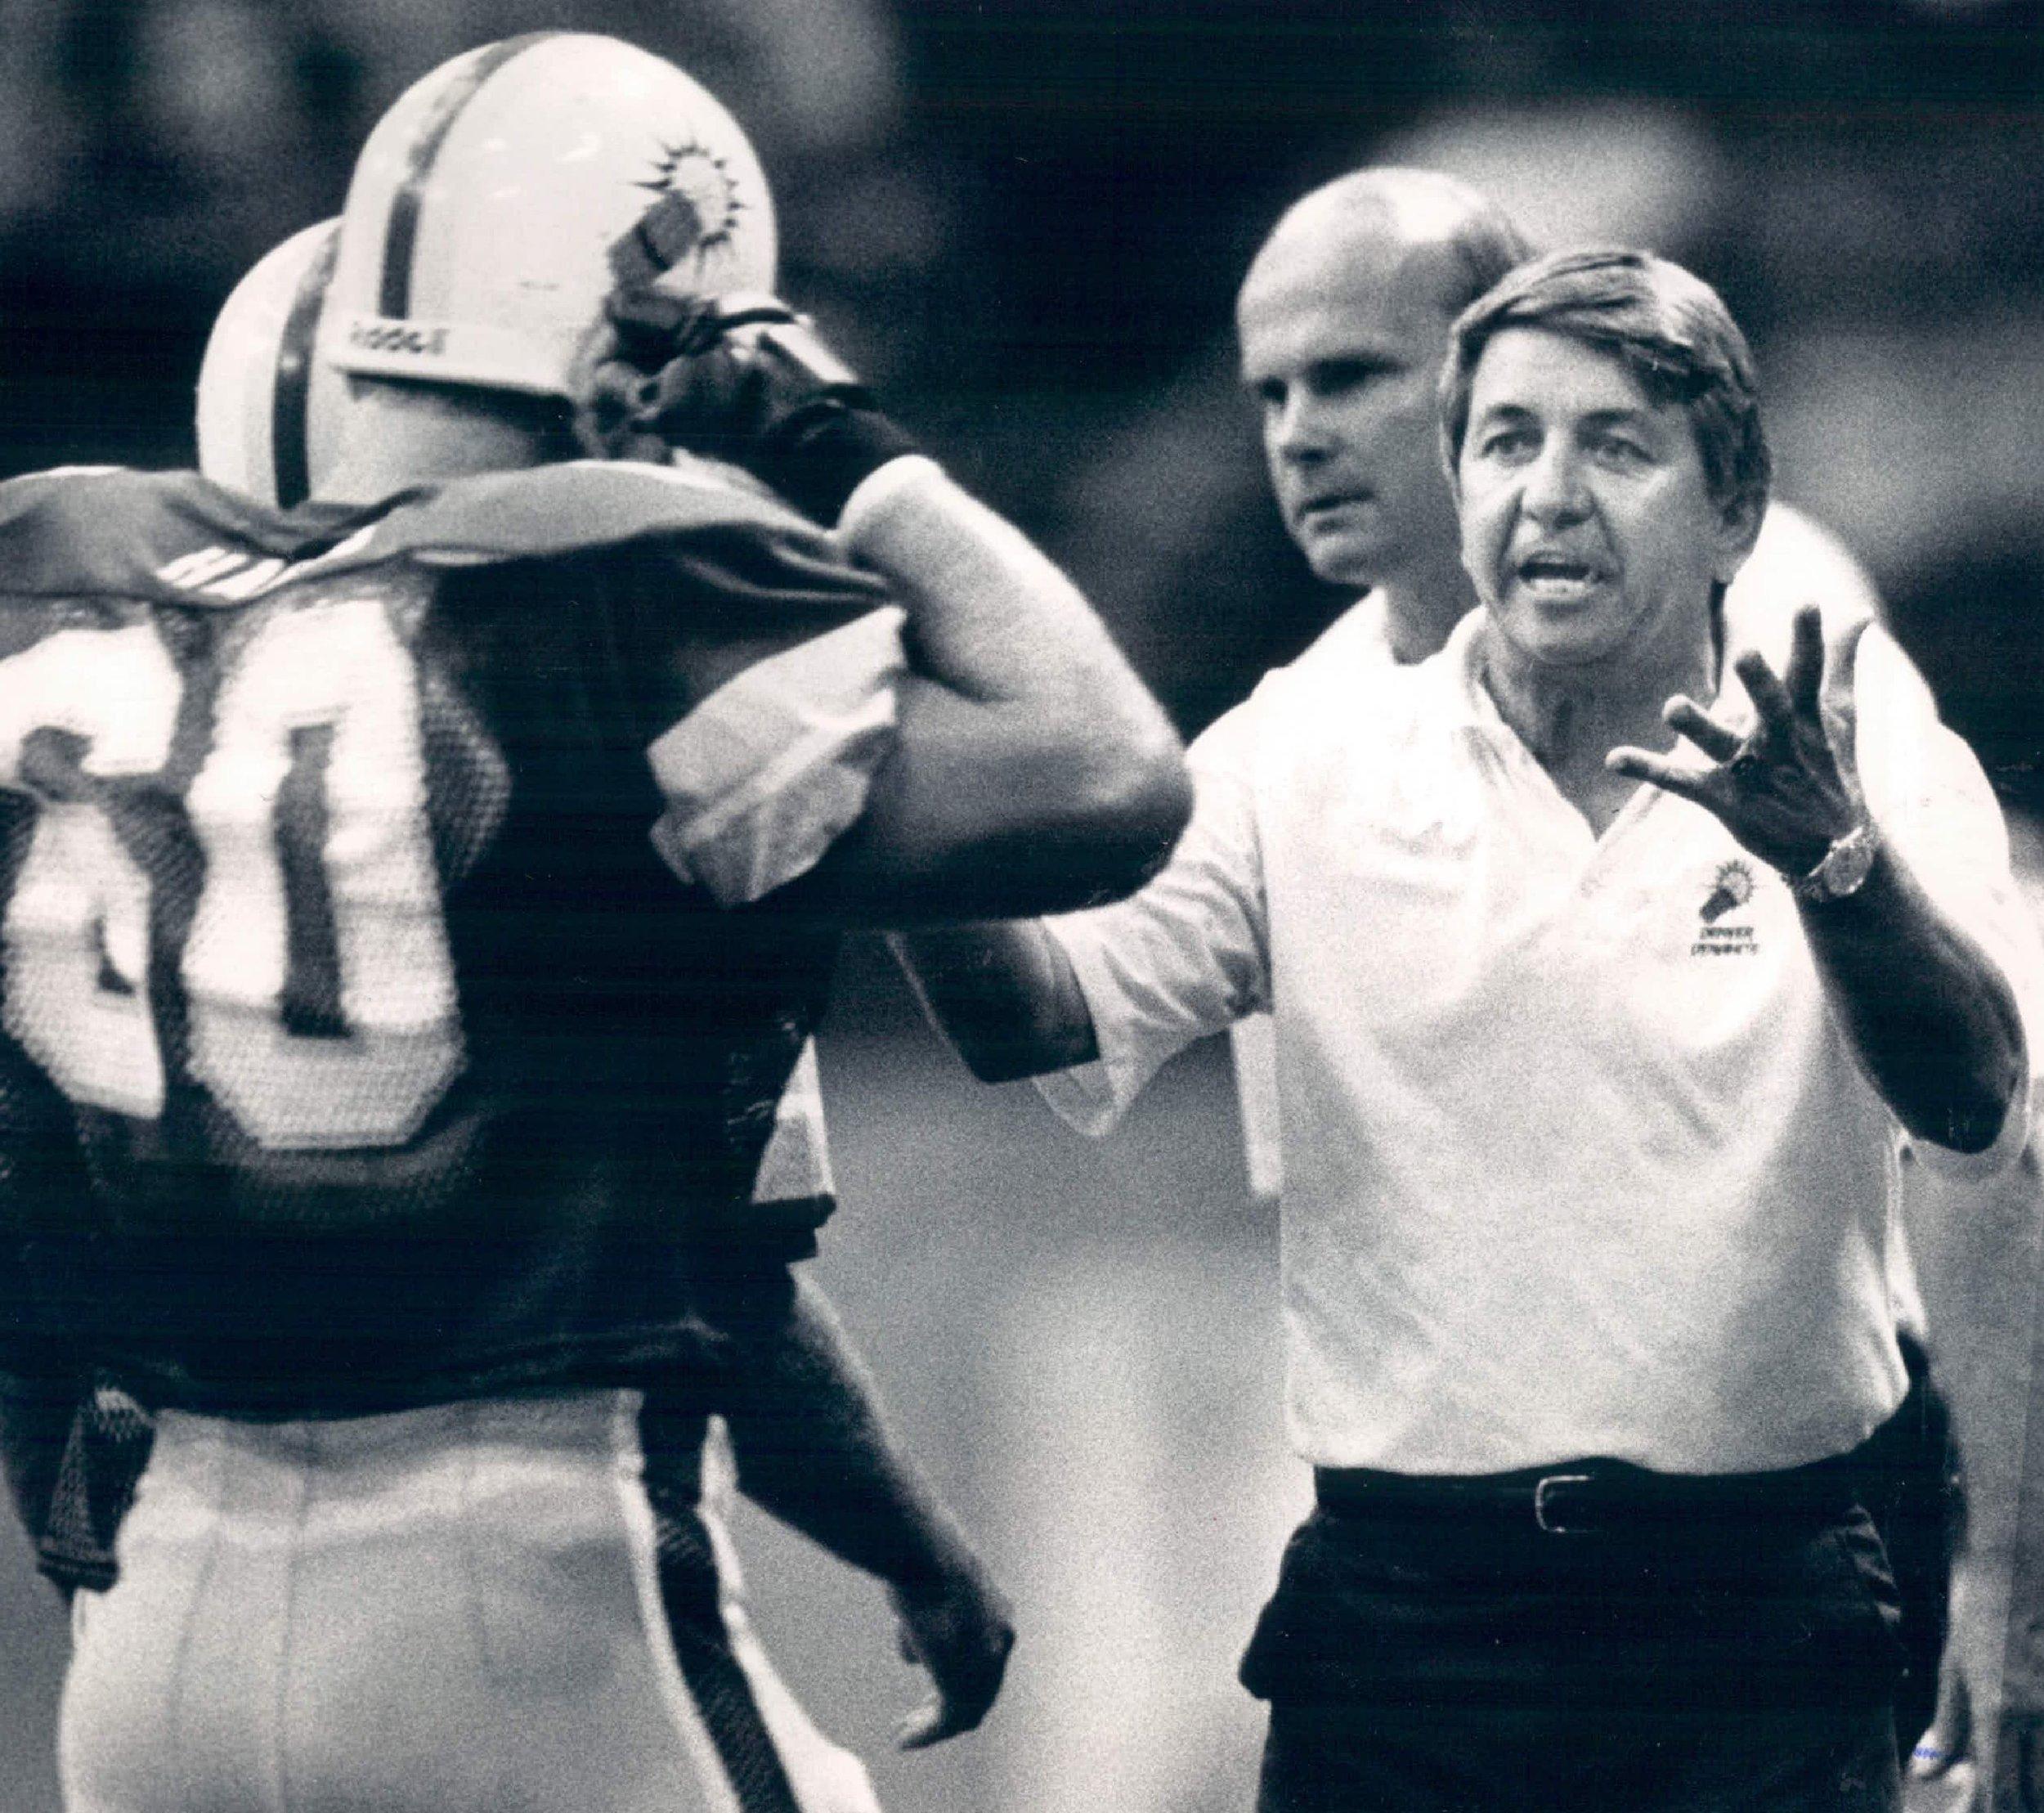 Tim-Marcum-coaches-the-1987-Denver-Dynamite.jpg